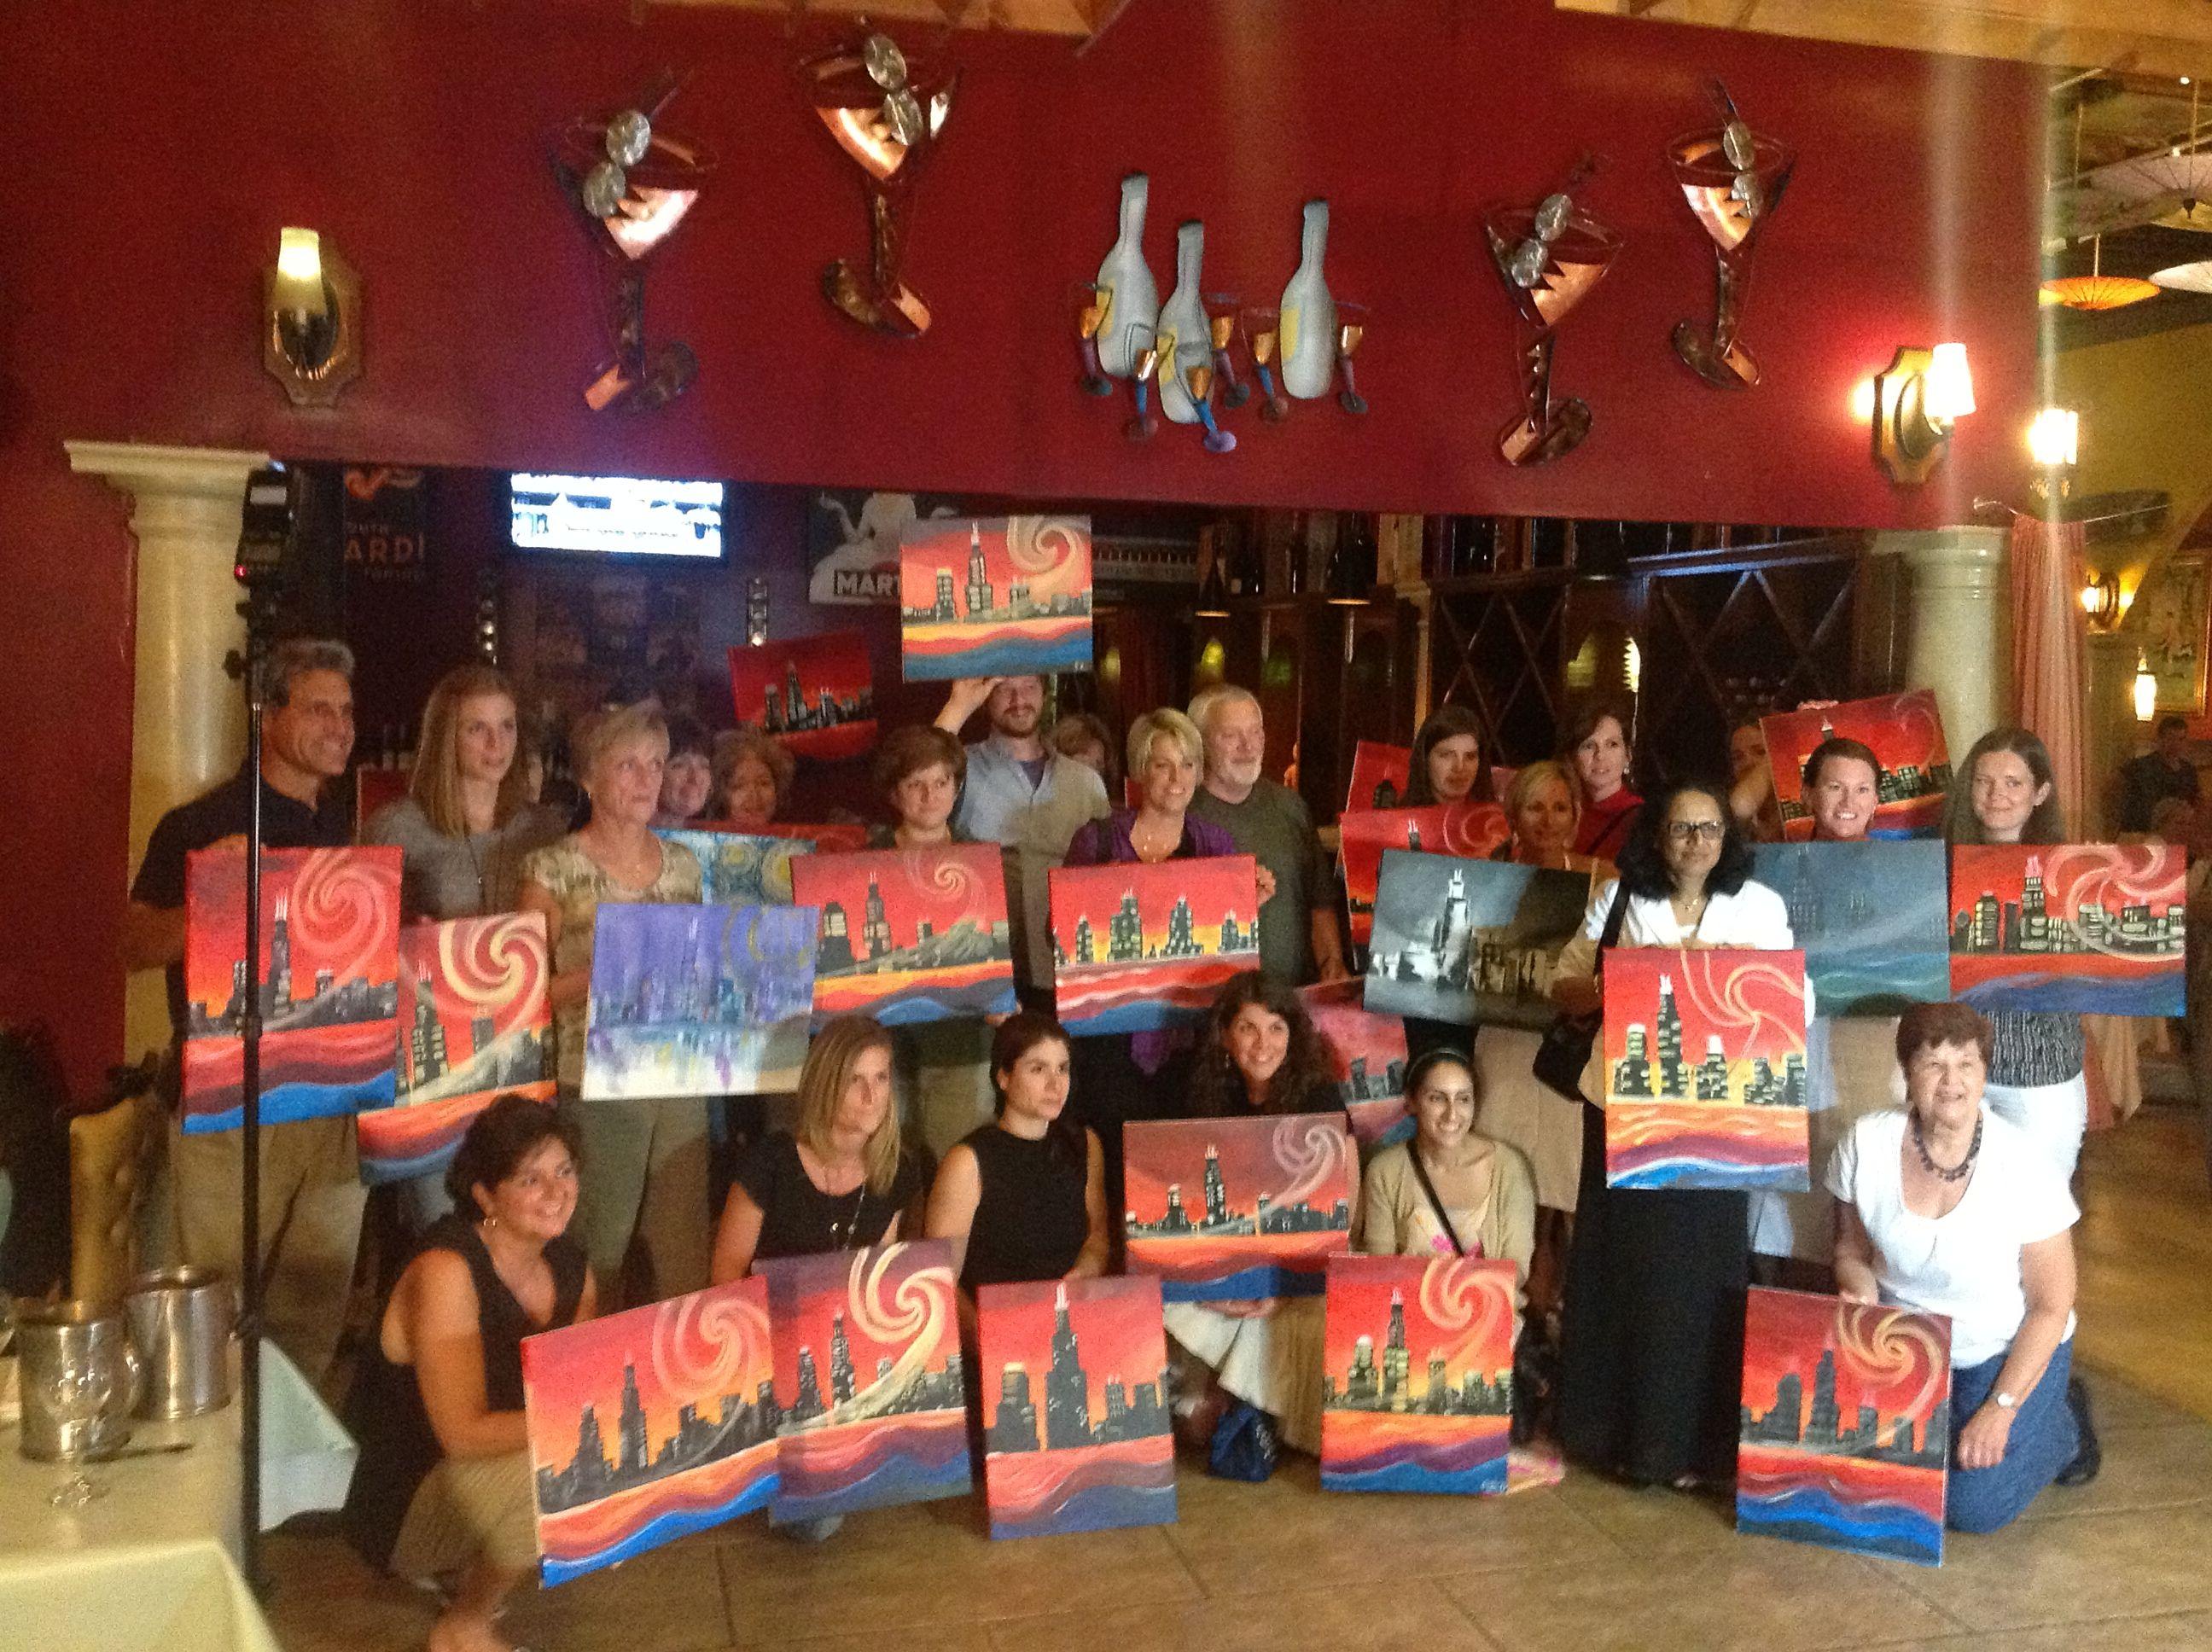 Thai Tuesday painting party!!!  Hosted by Bottle & Bottega, La Grange